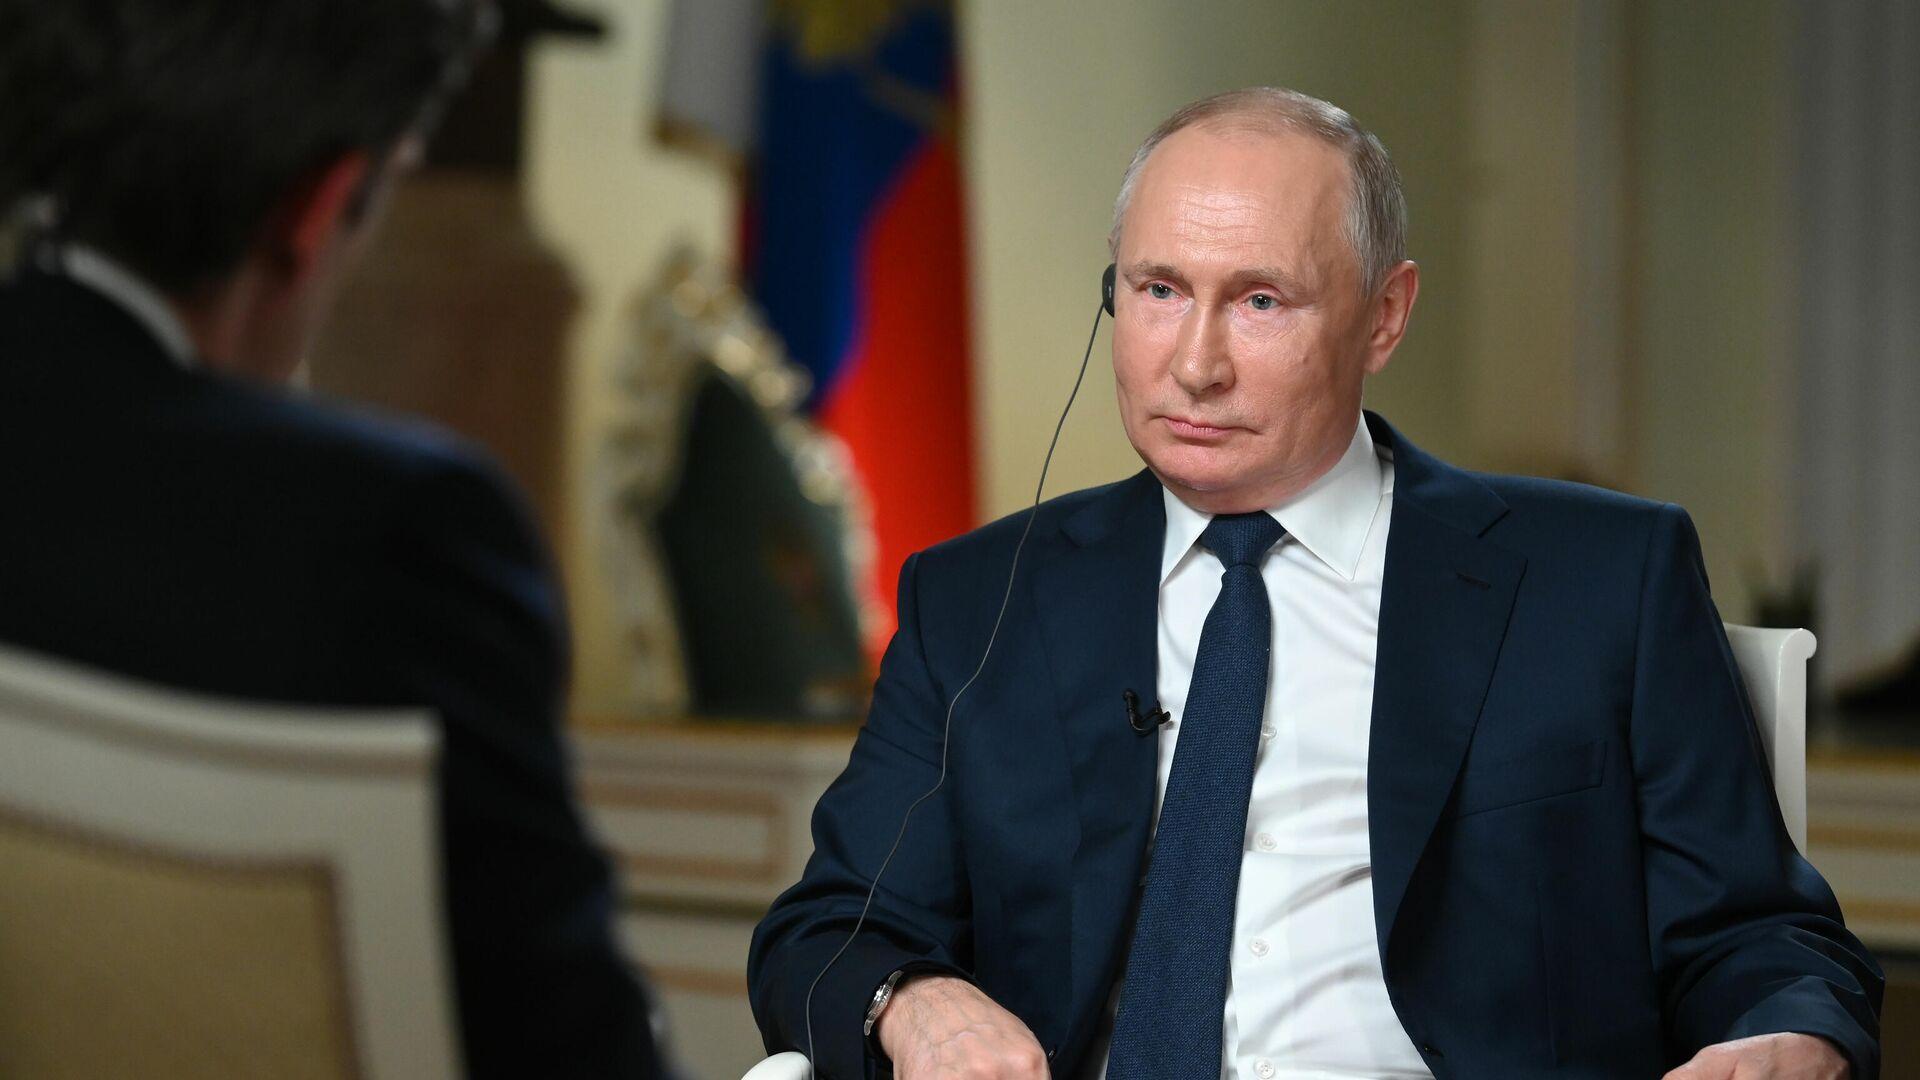 Президент РФ Владимир Путин отвечает на вопросы журналиста телекомпании NBC Кира Симмонса - РИА Новости, 1920, 16.06.2021